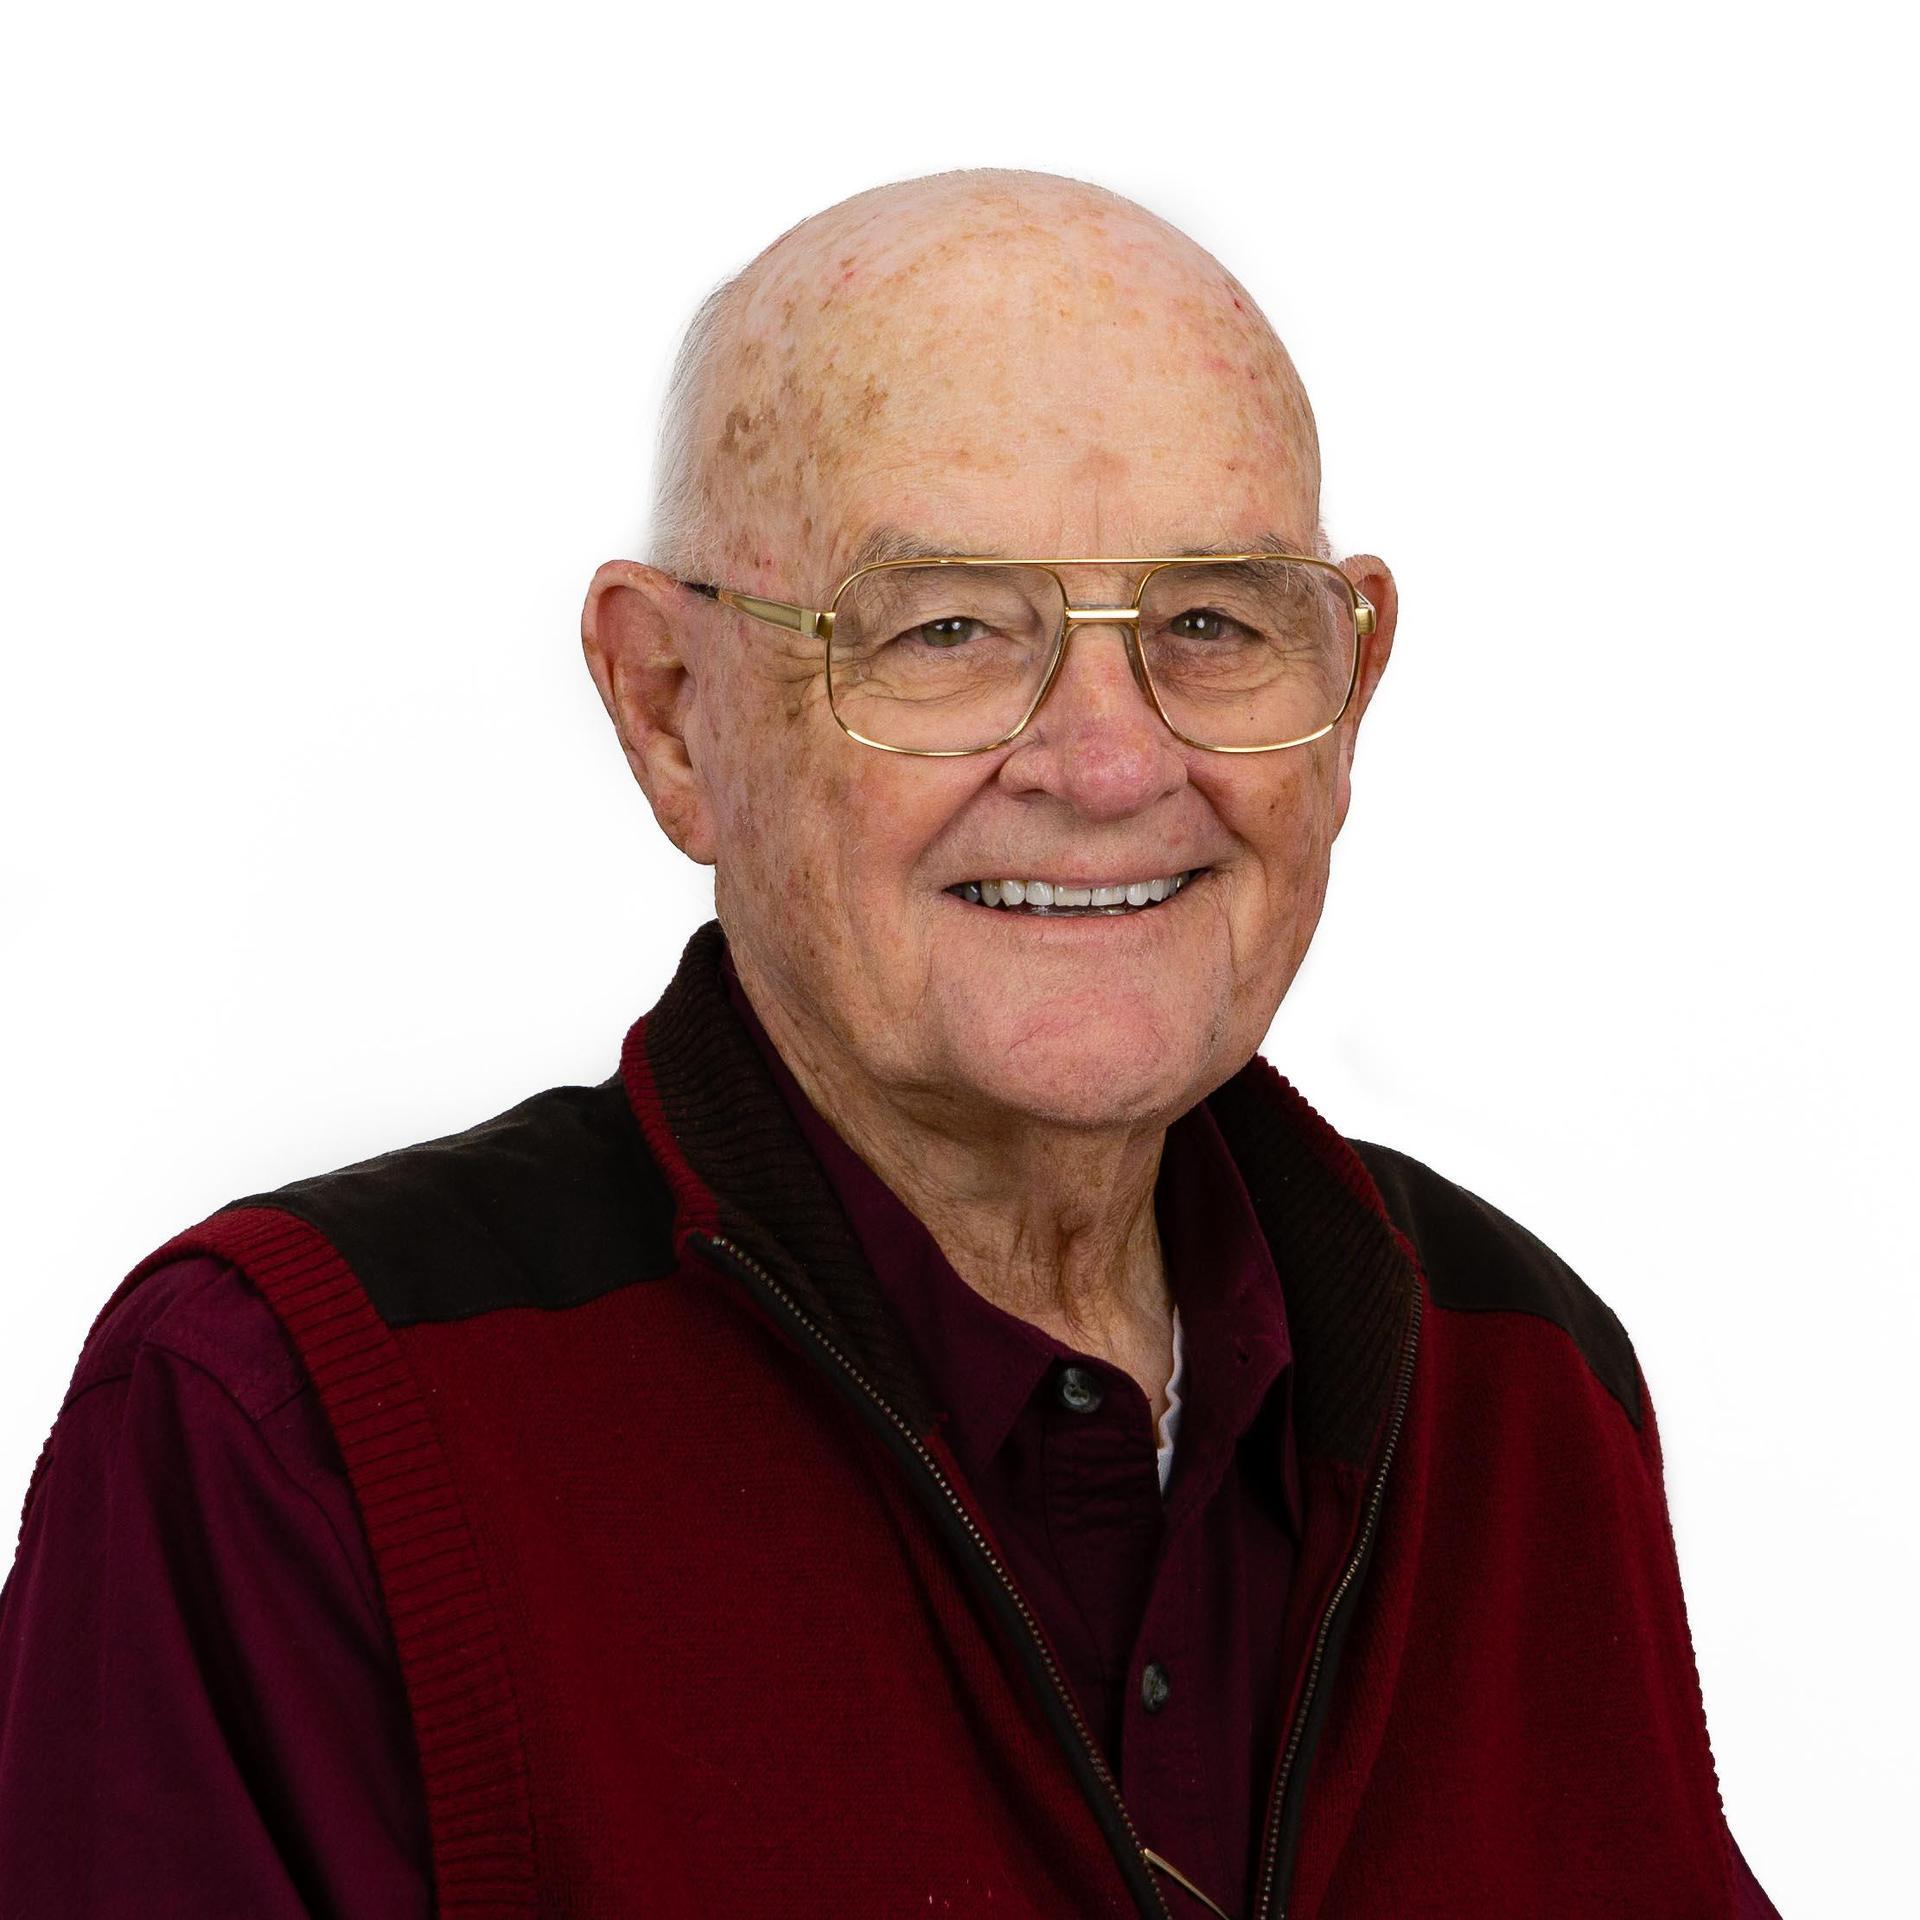 Ken Marks